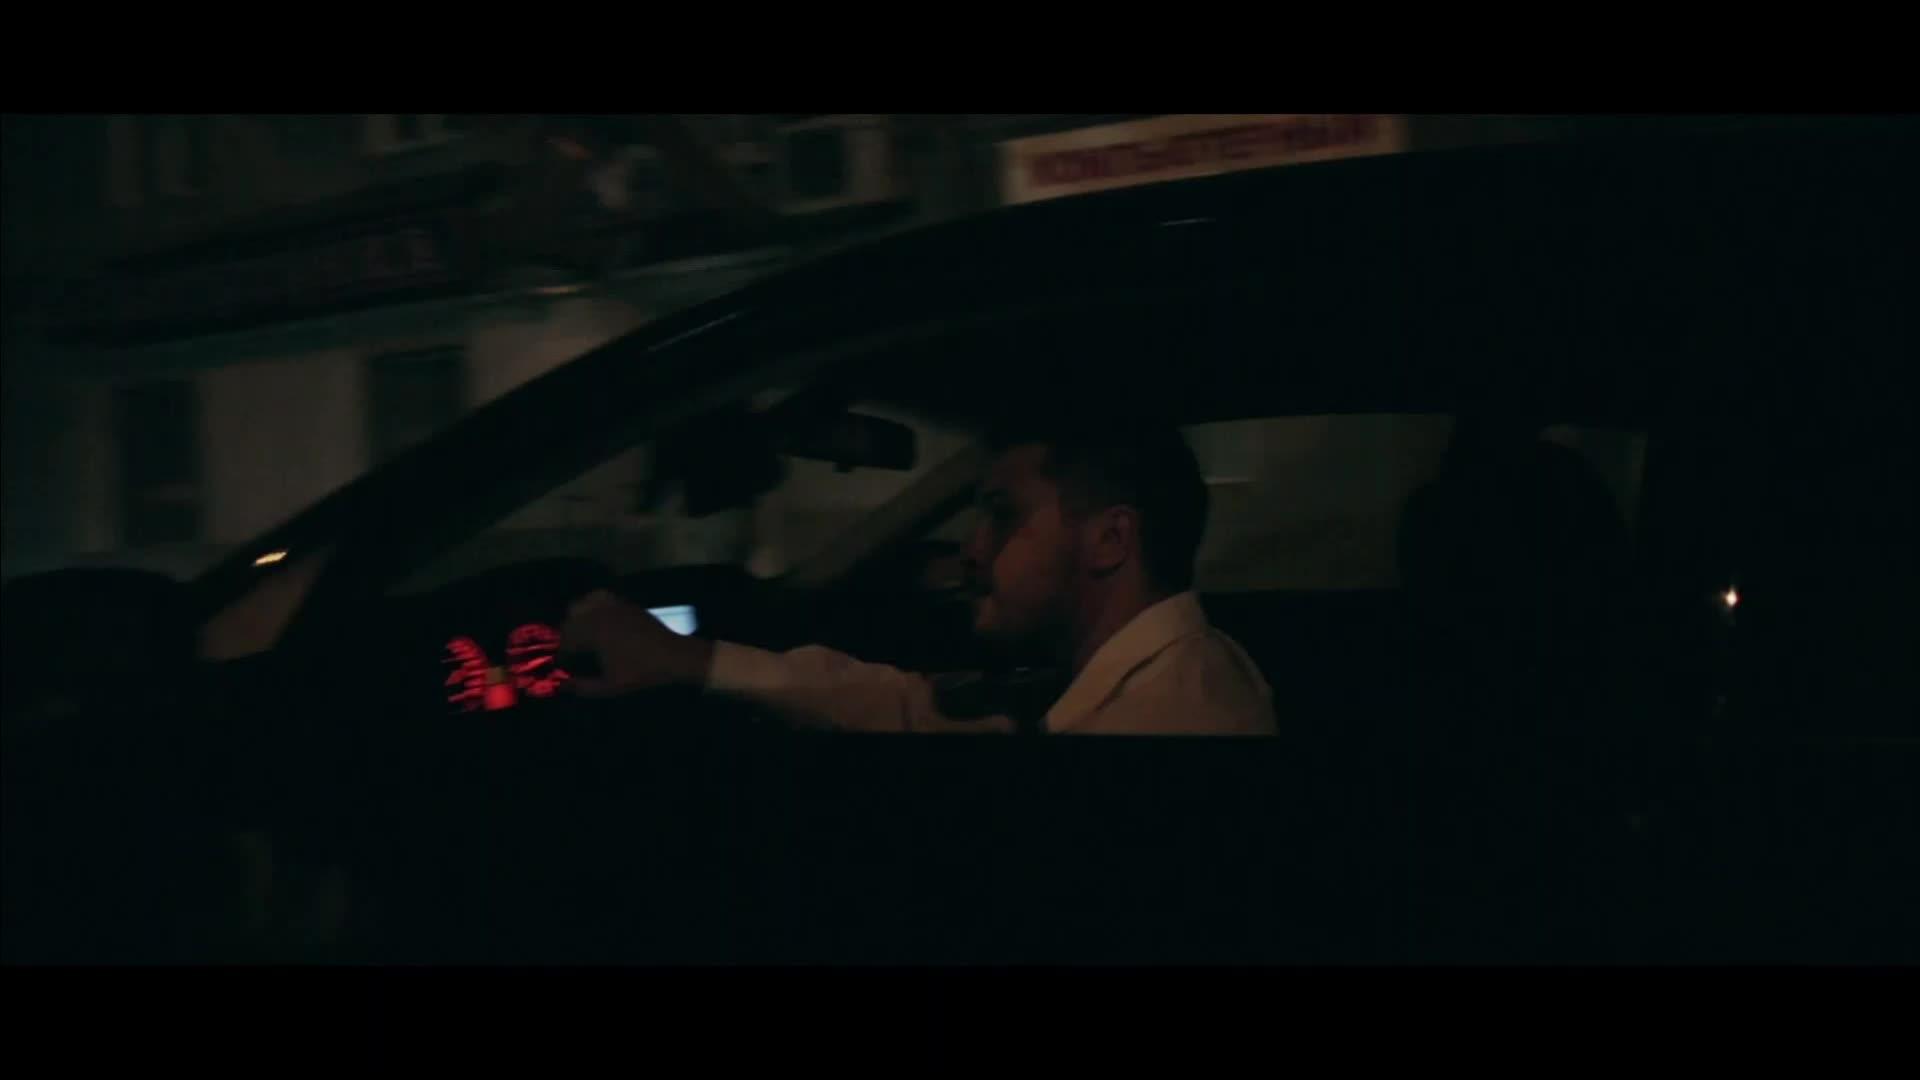 filmi-onlayn-visokogo-kachestva-hd